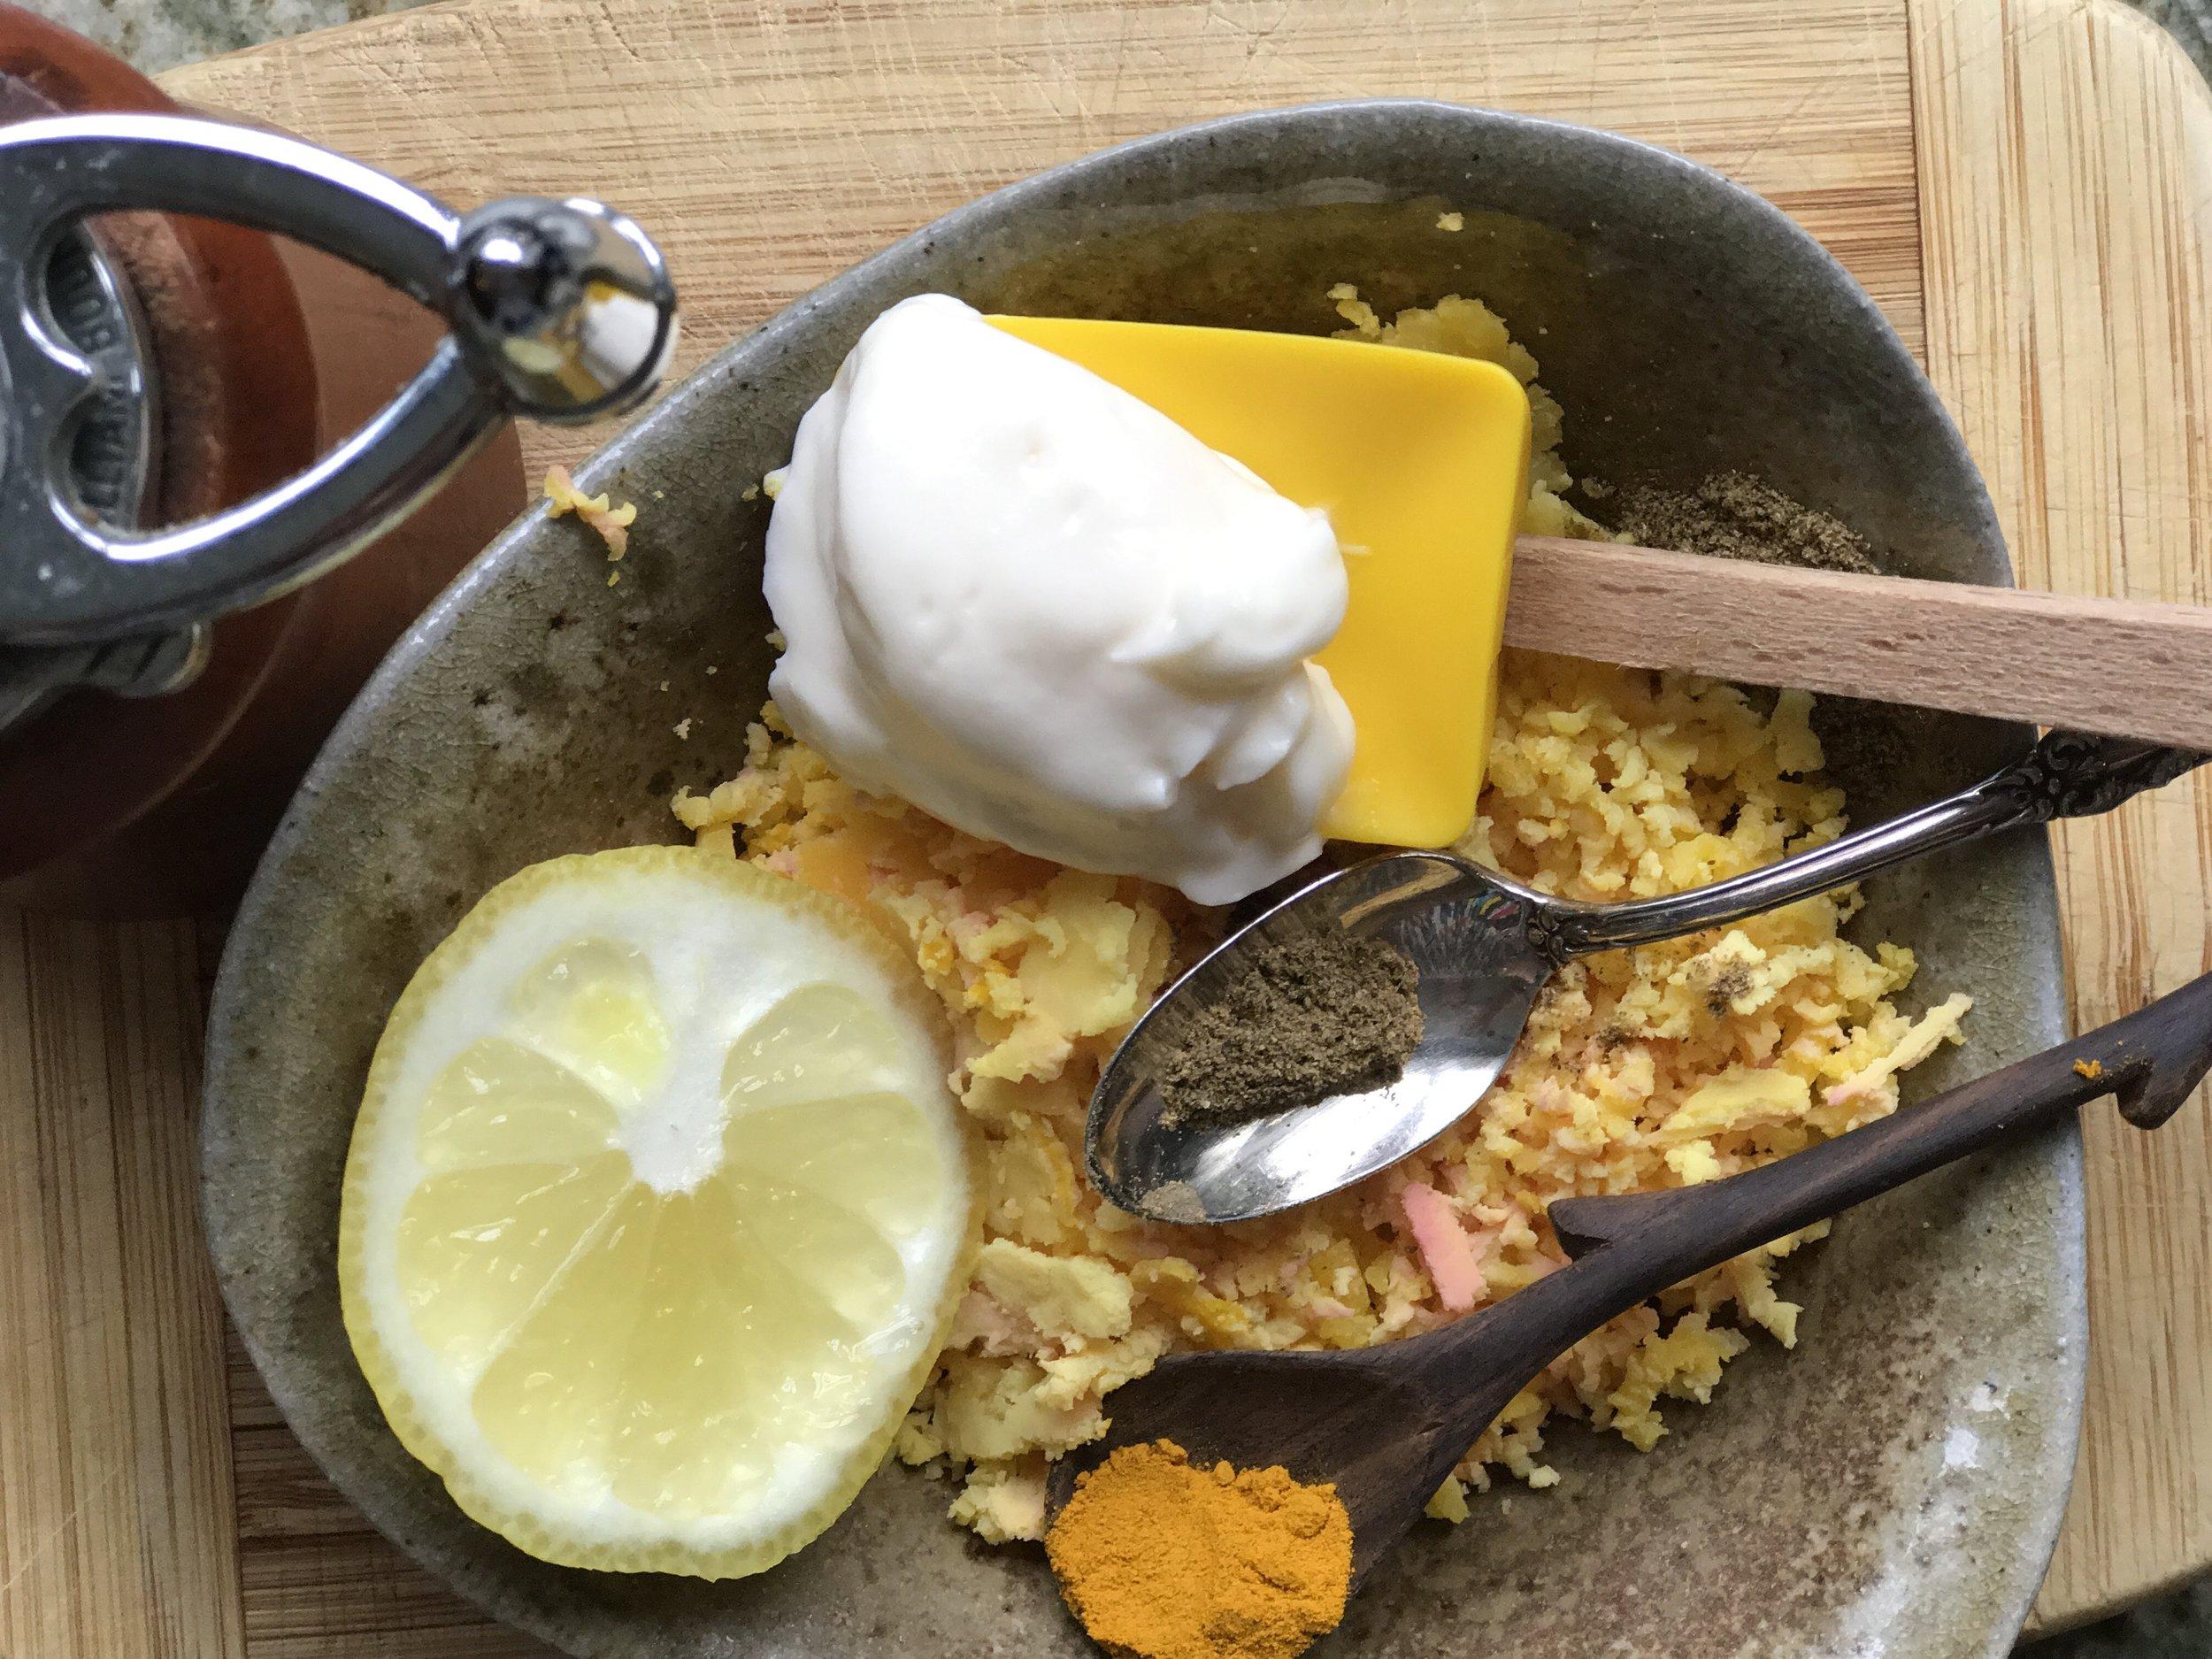 Prep the filling! - I used mayo, cumin, turmeric and lemon juice.